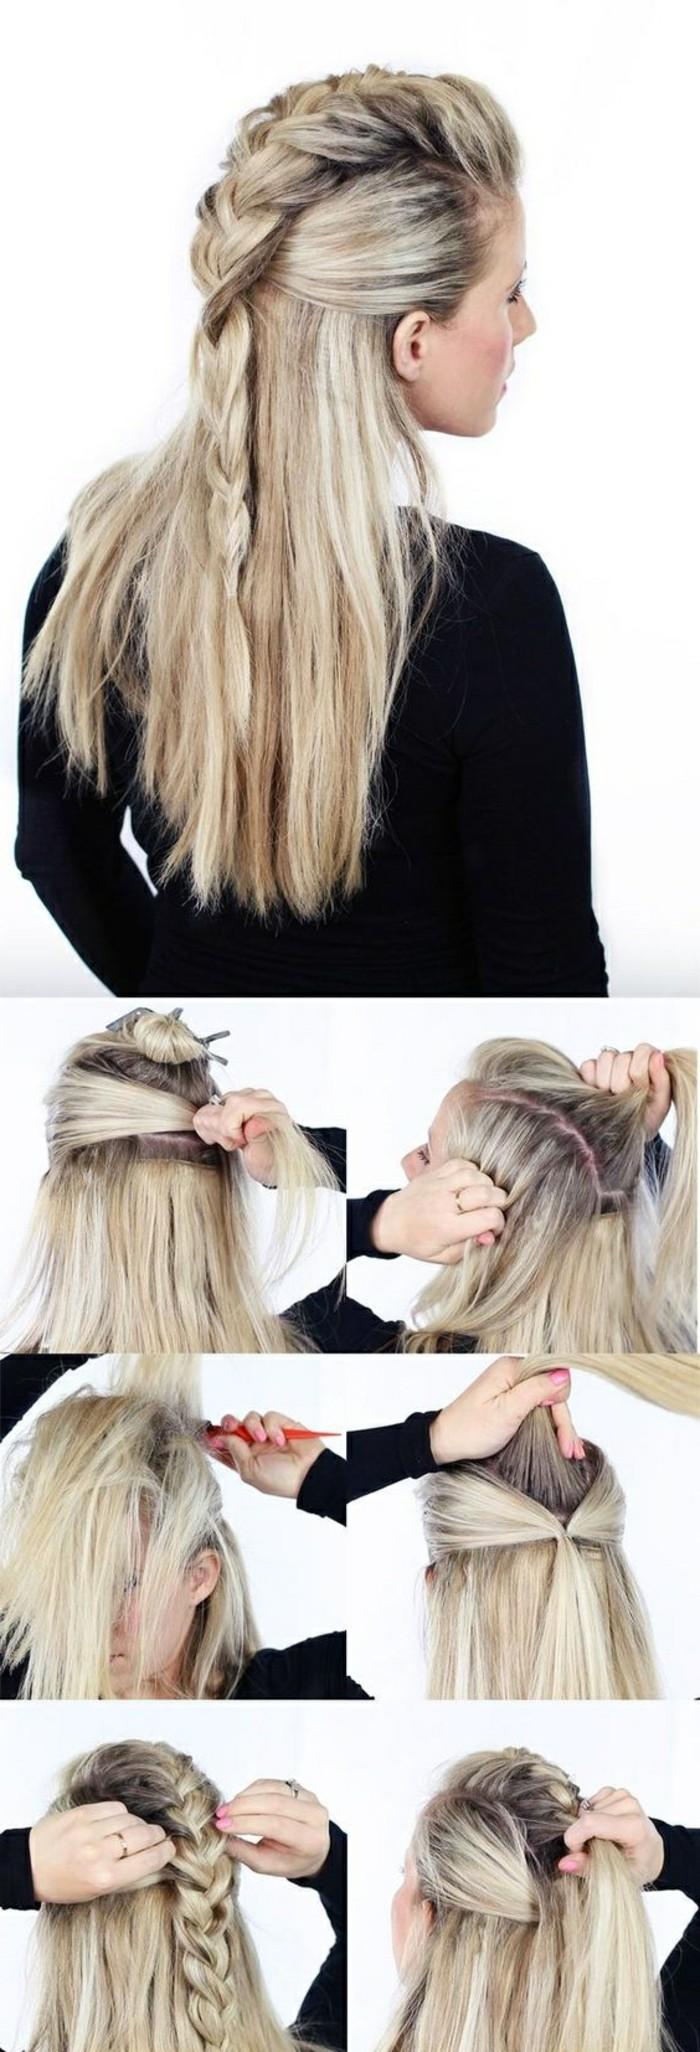 recogido con trenzas paso a paso, peinados faciles y rapidos, cabello largo liso con bonita trenza